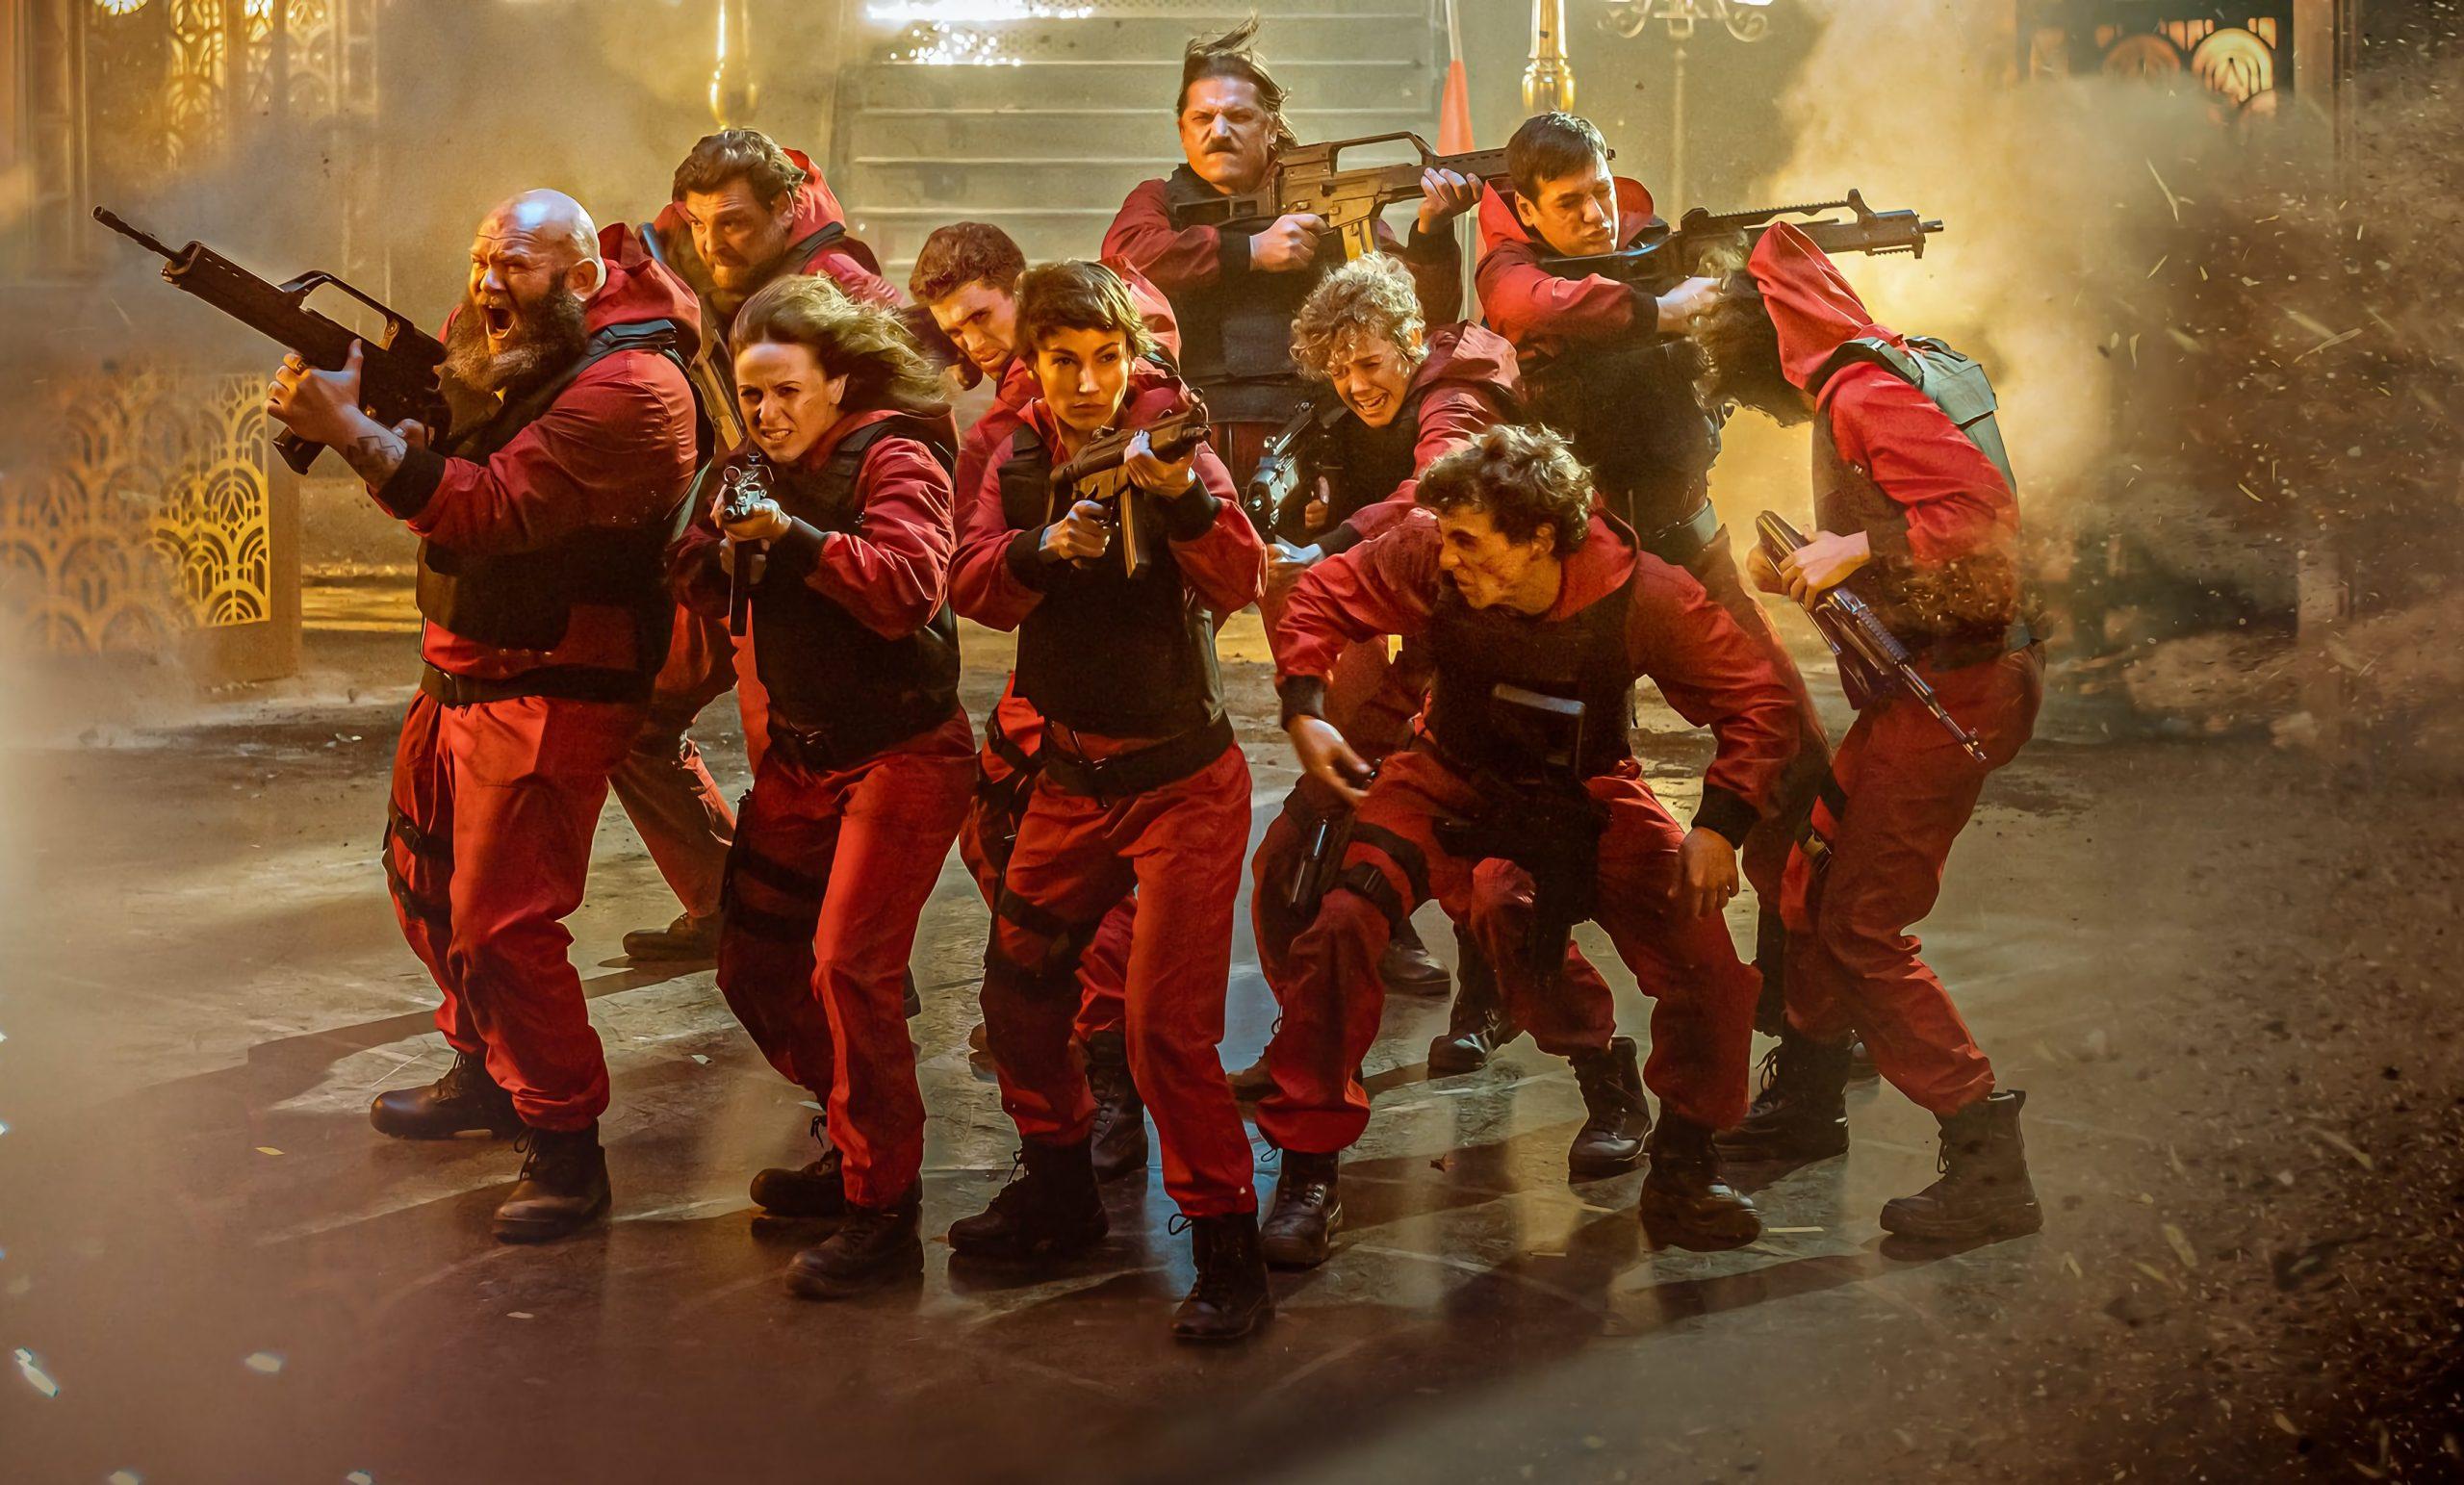 La Casa de Papel: Το trailer για την 5η σεζόν είναι εκρηκτικό